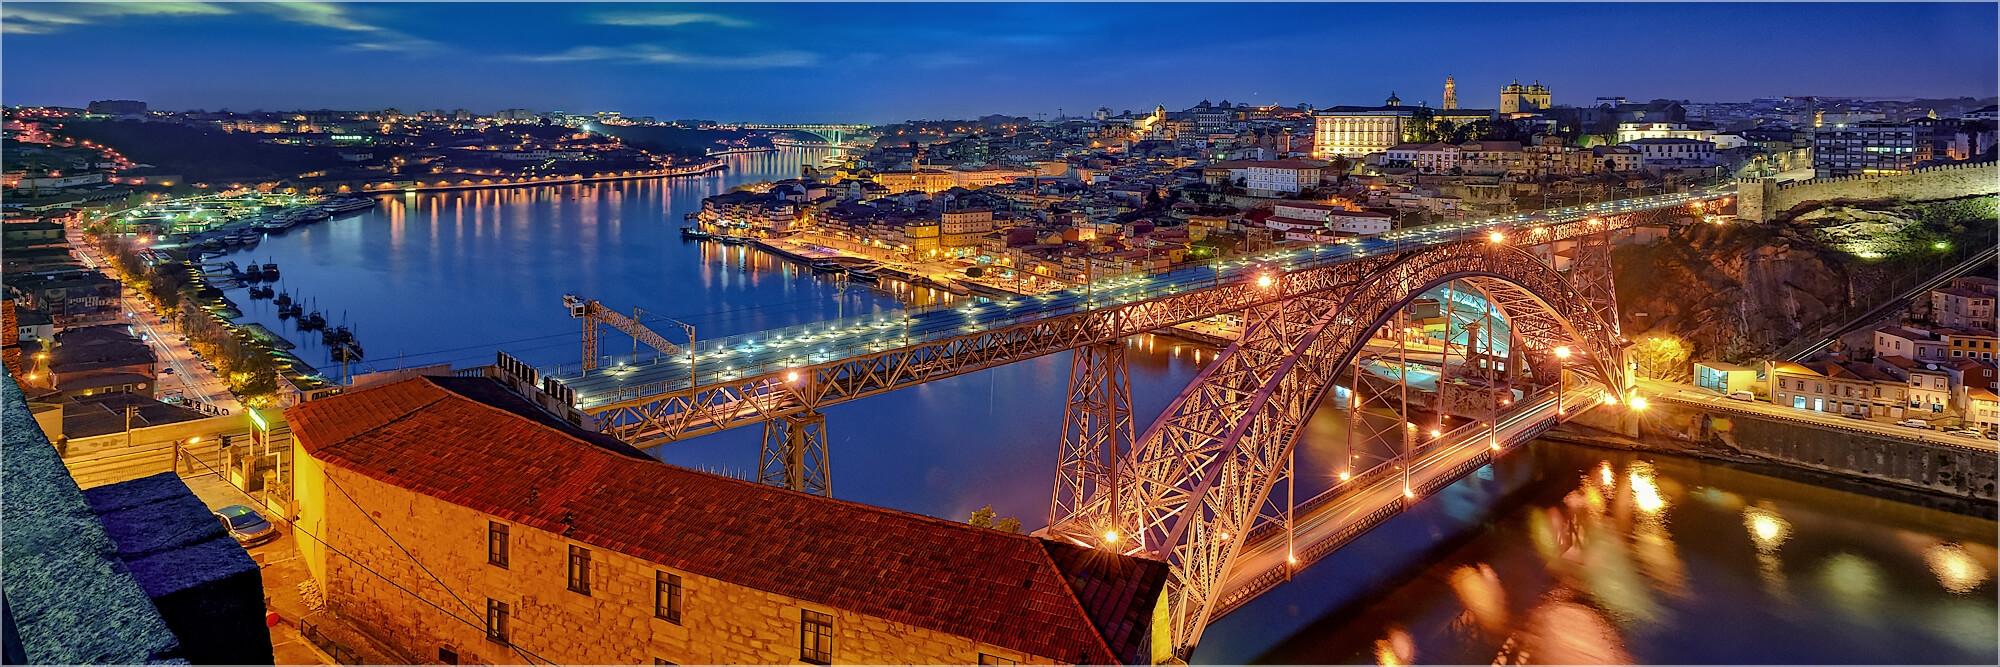 Panoramabild Porto Portugal Altstadt